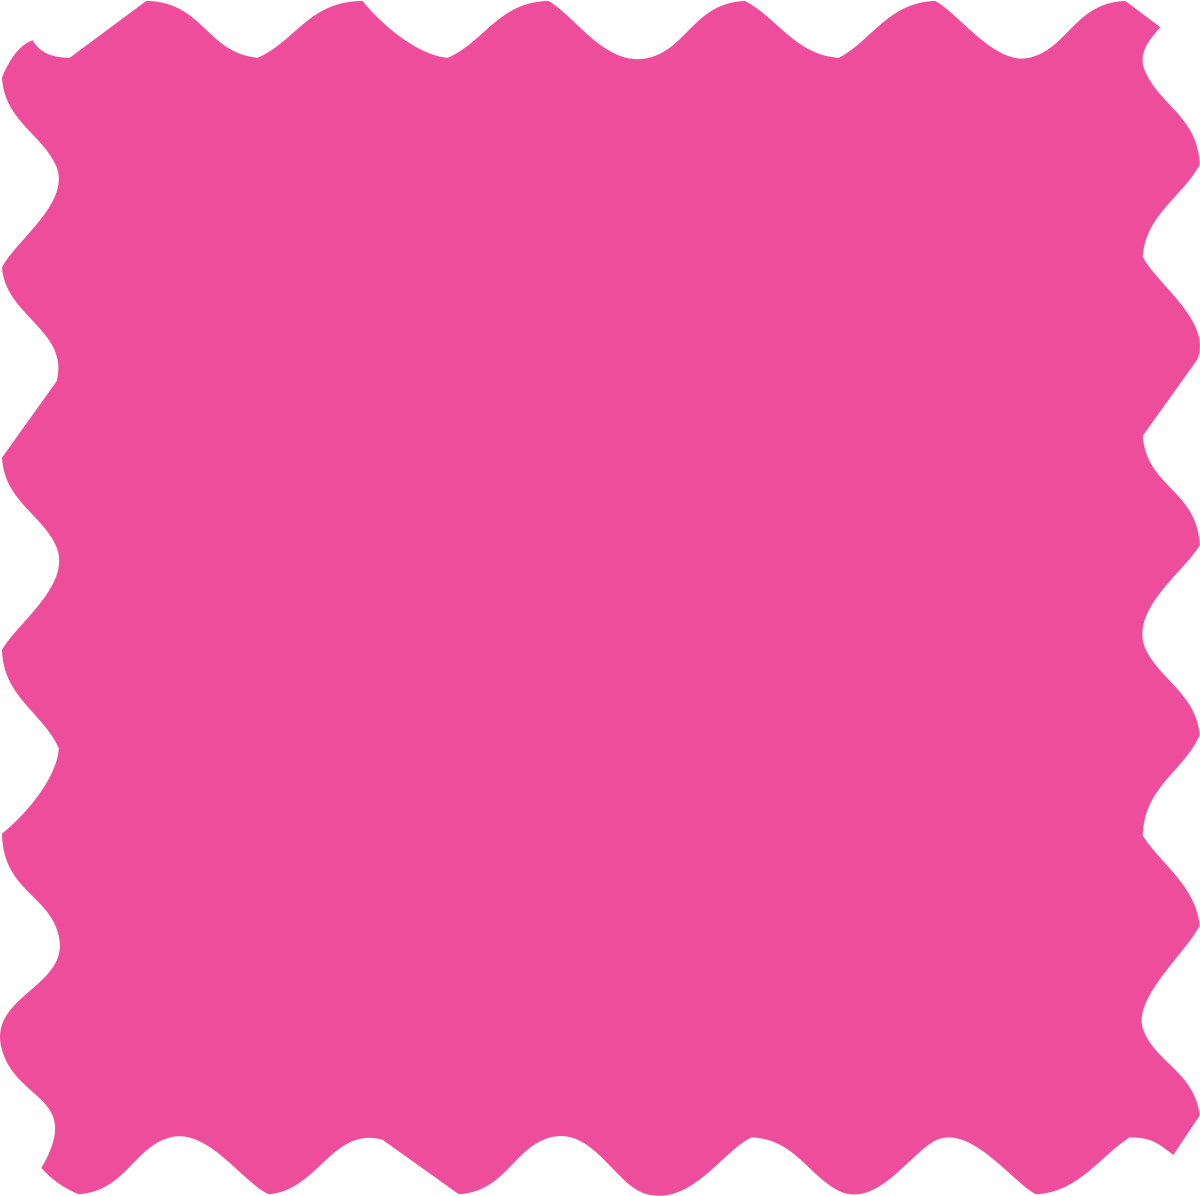 Fabric Creations™ Neon Black Light Fabric Paint - Pink, 2 oz.